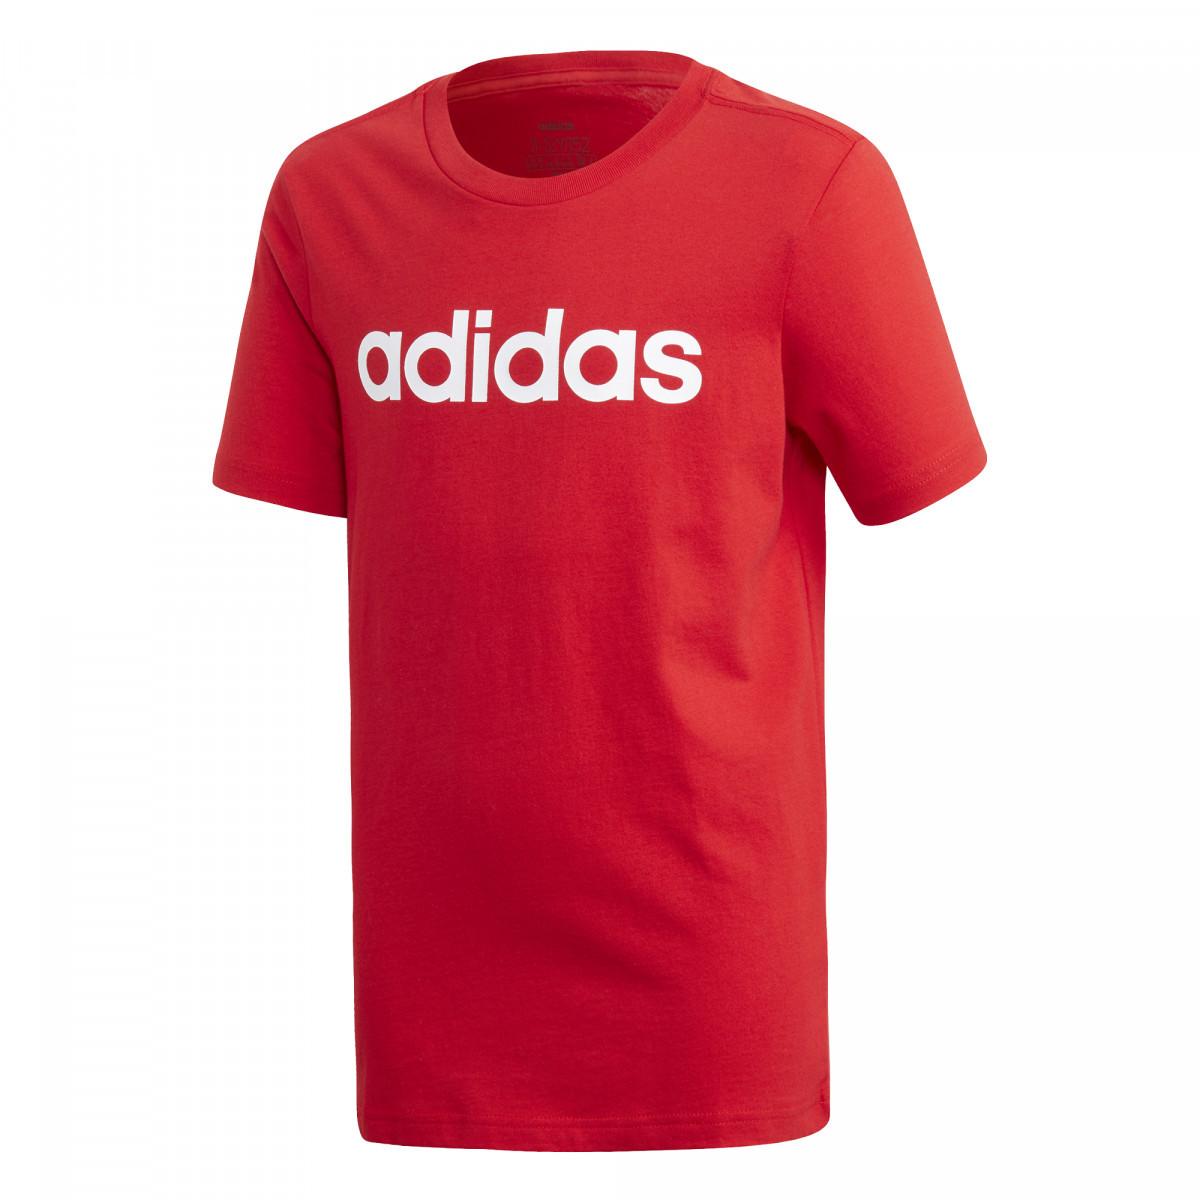 Adidas tričko Yb E Lin Tee red Velikost: 152